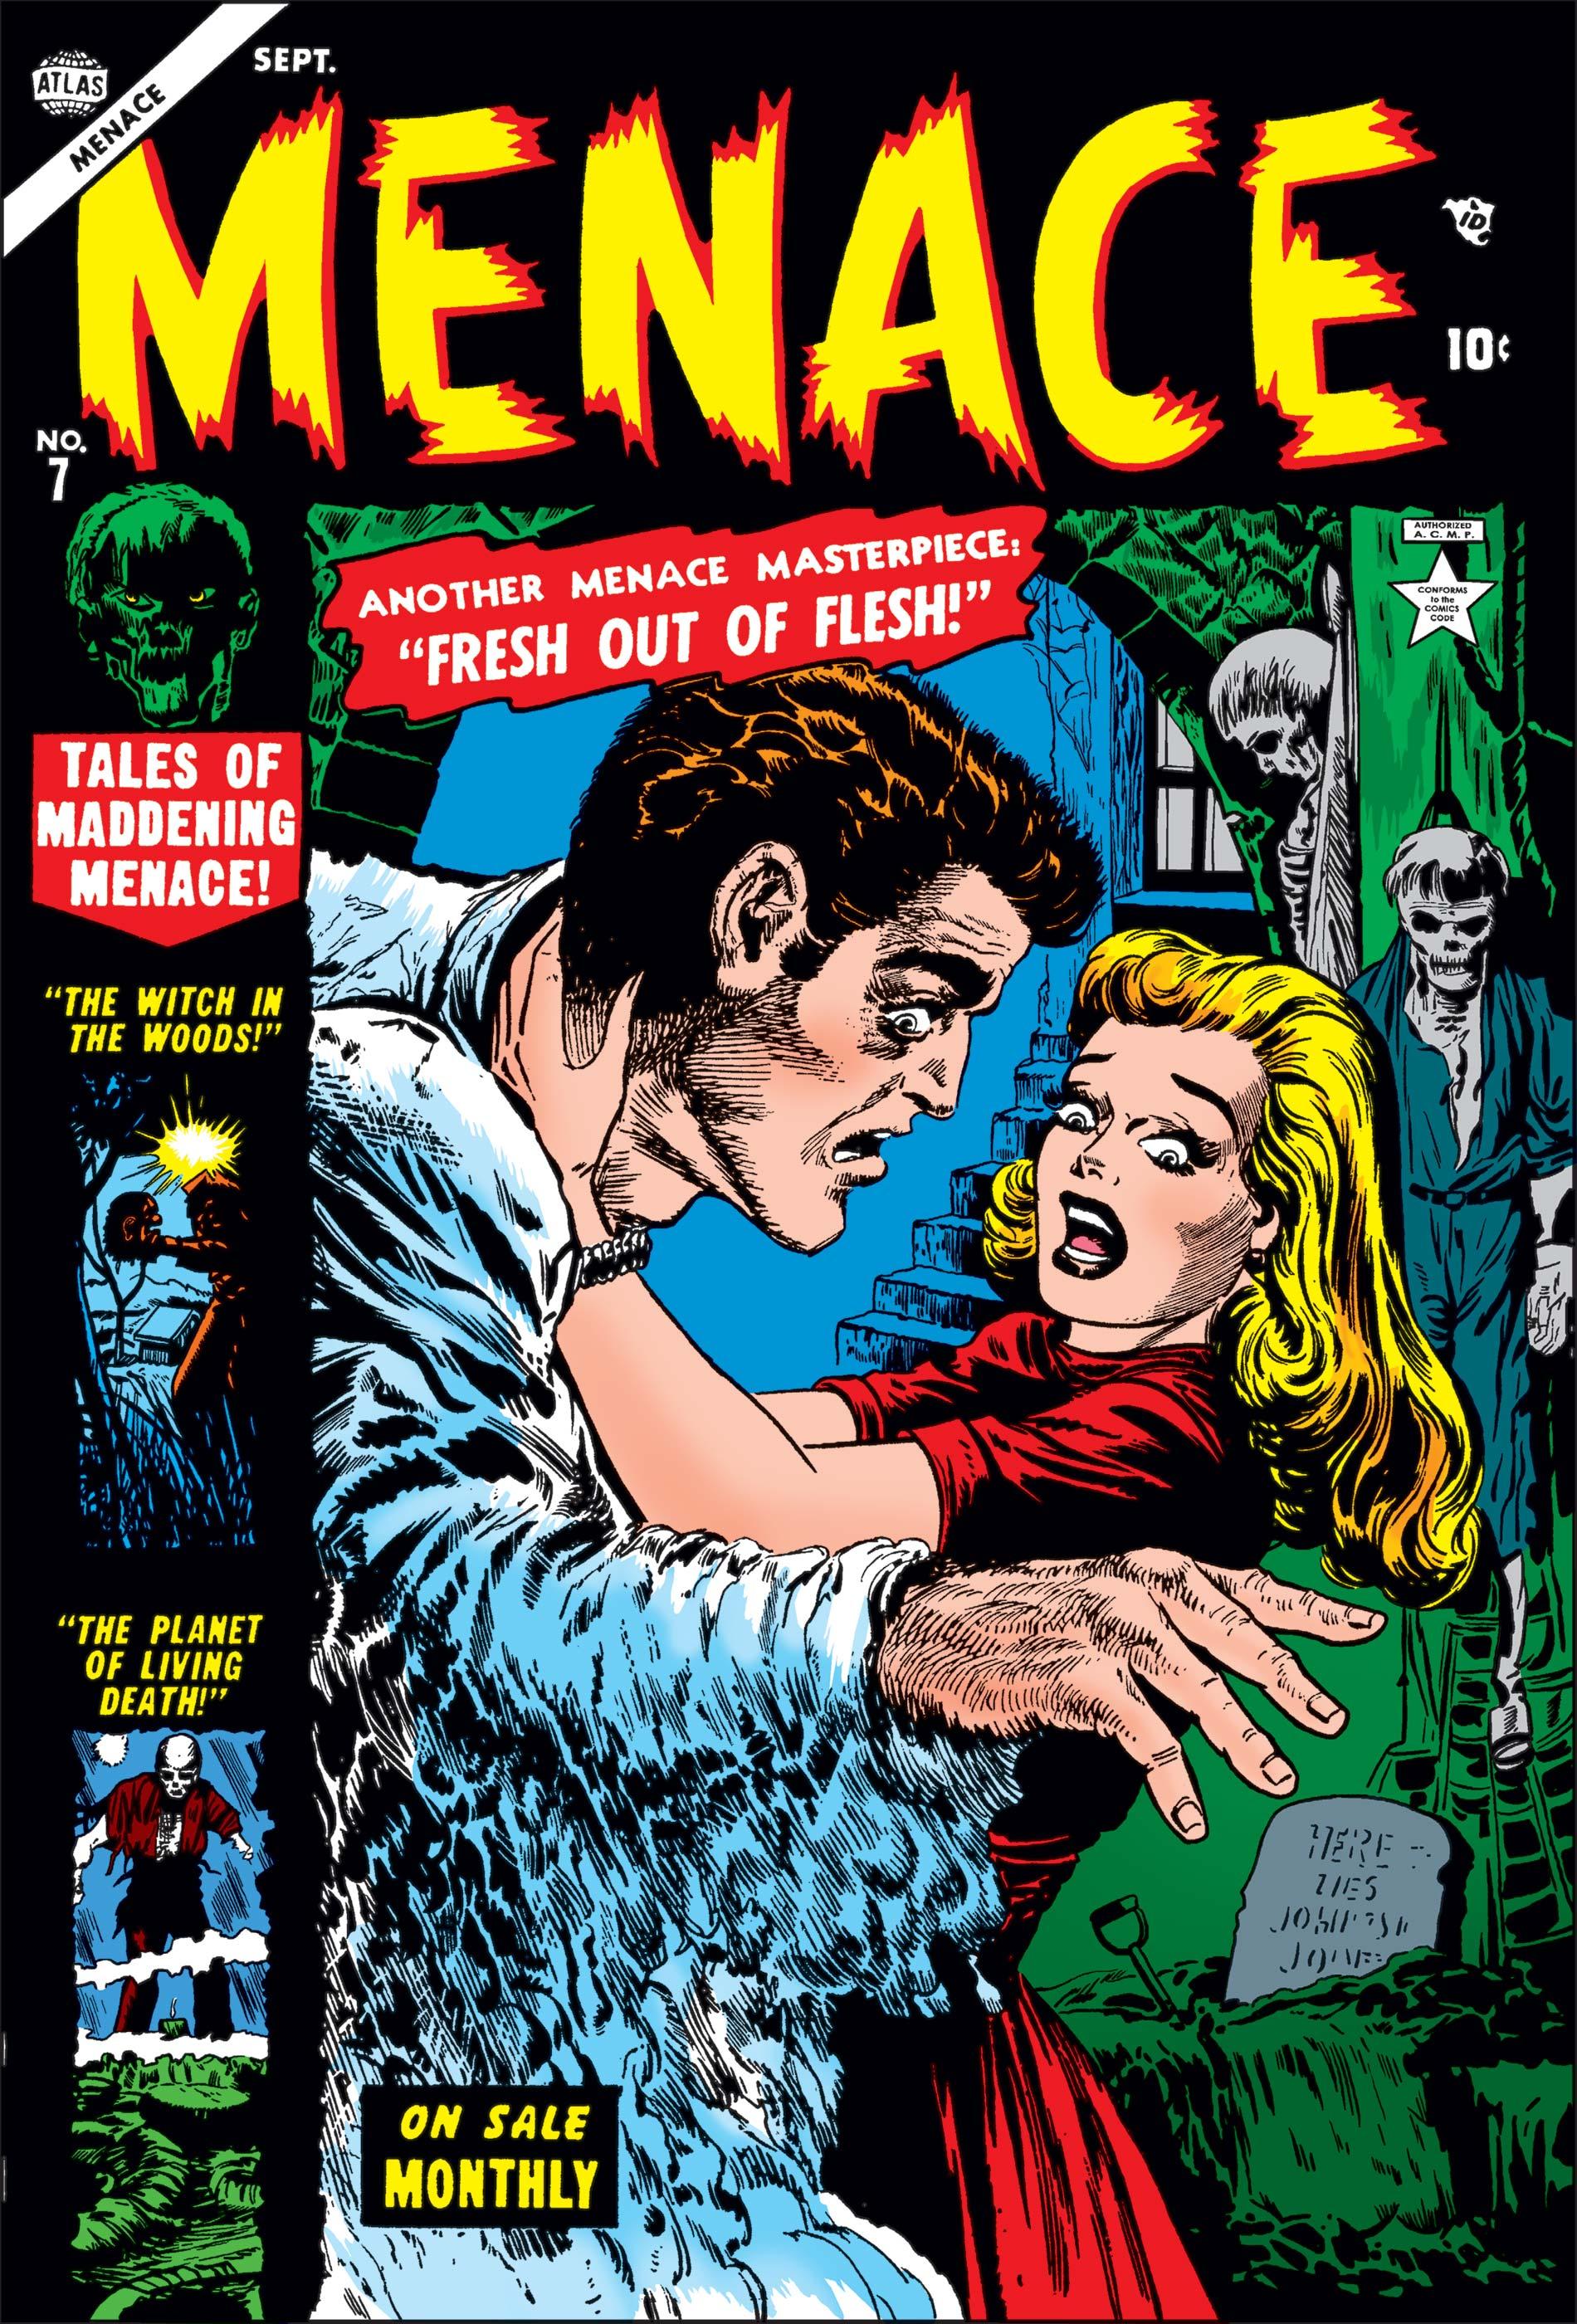 Menace (1953) #7